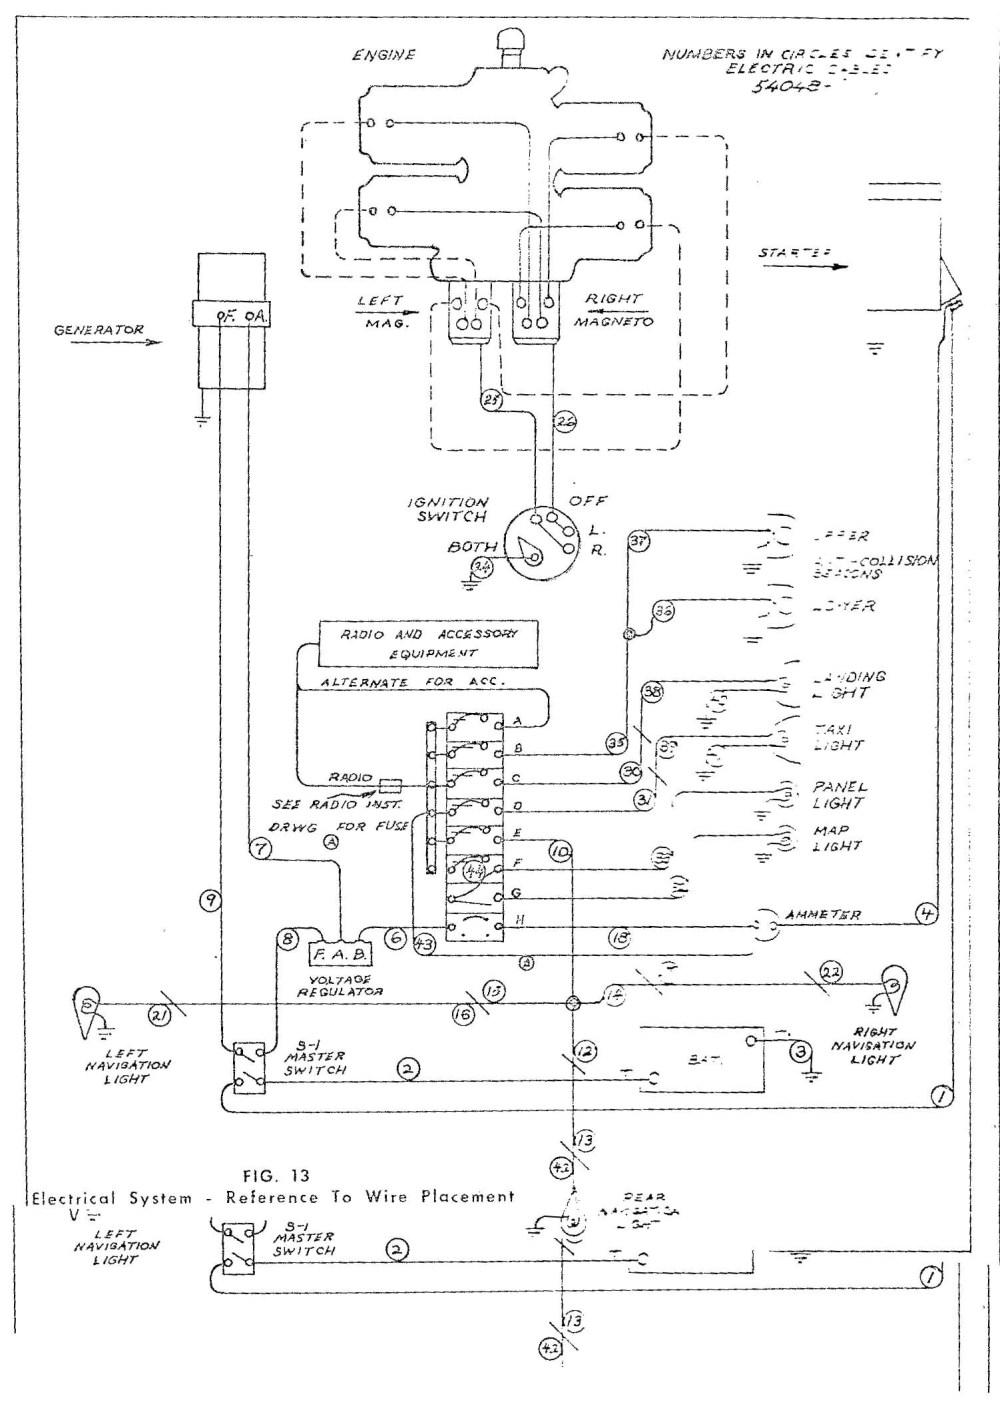 medium resolution of siemens shunt trip breaker wiring diagram wiring diagram for shuntsiemens shunt trip breaker wiring diagram wiring